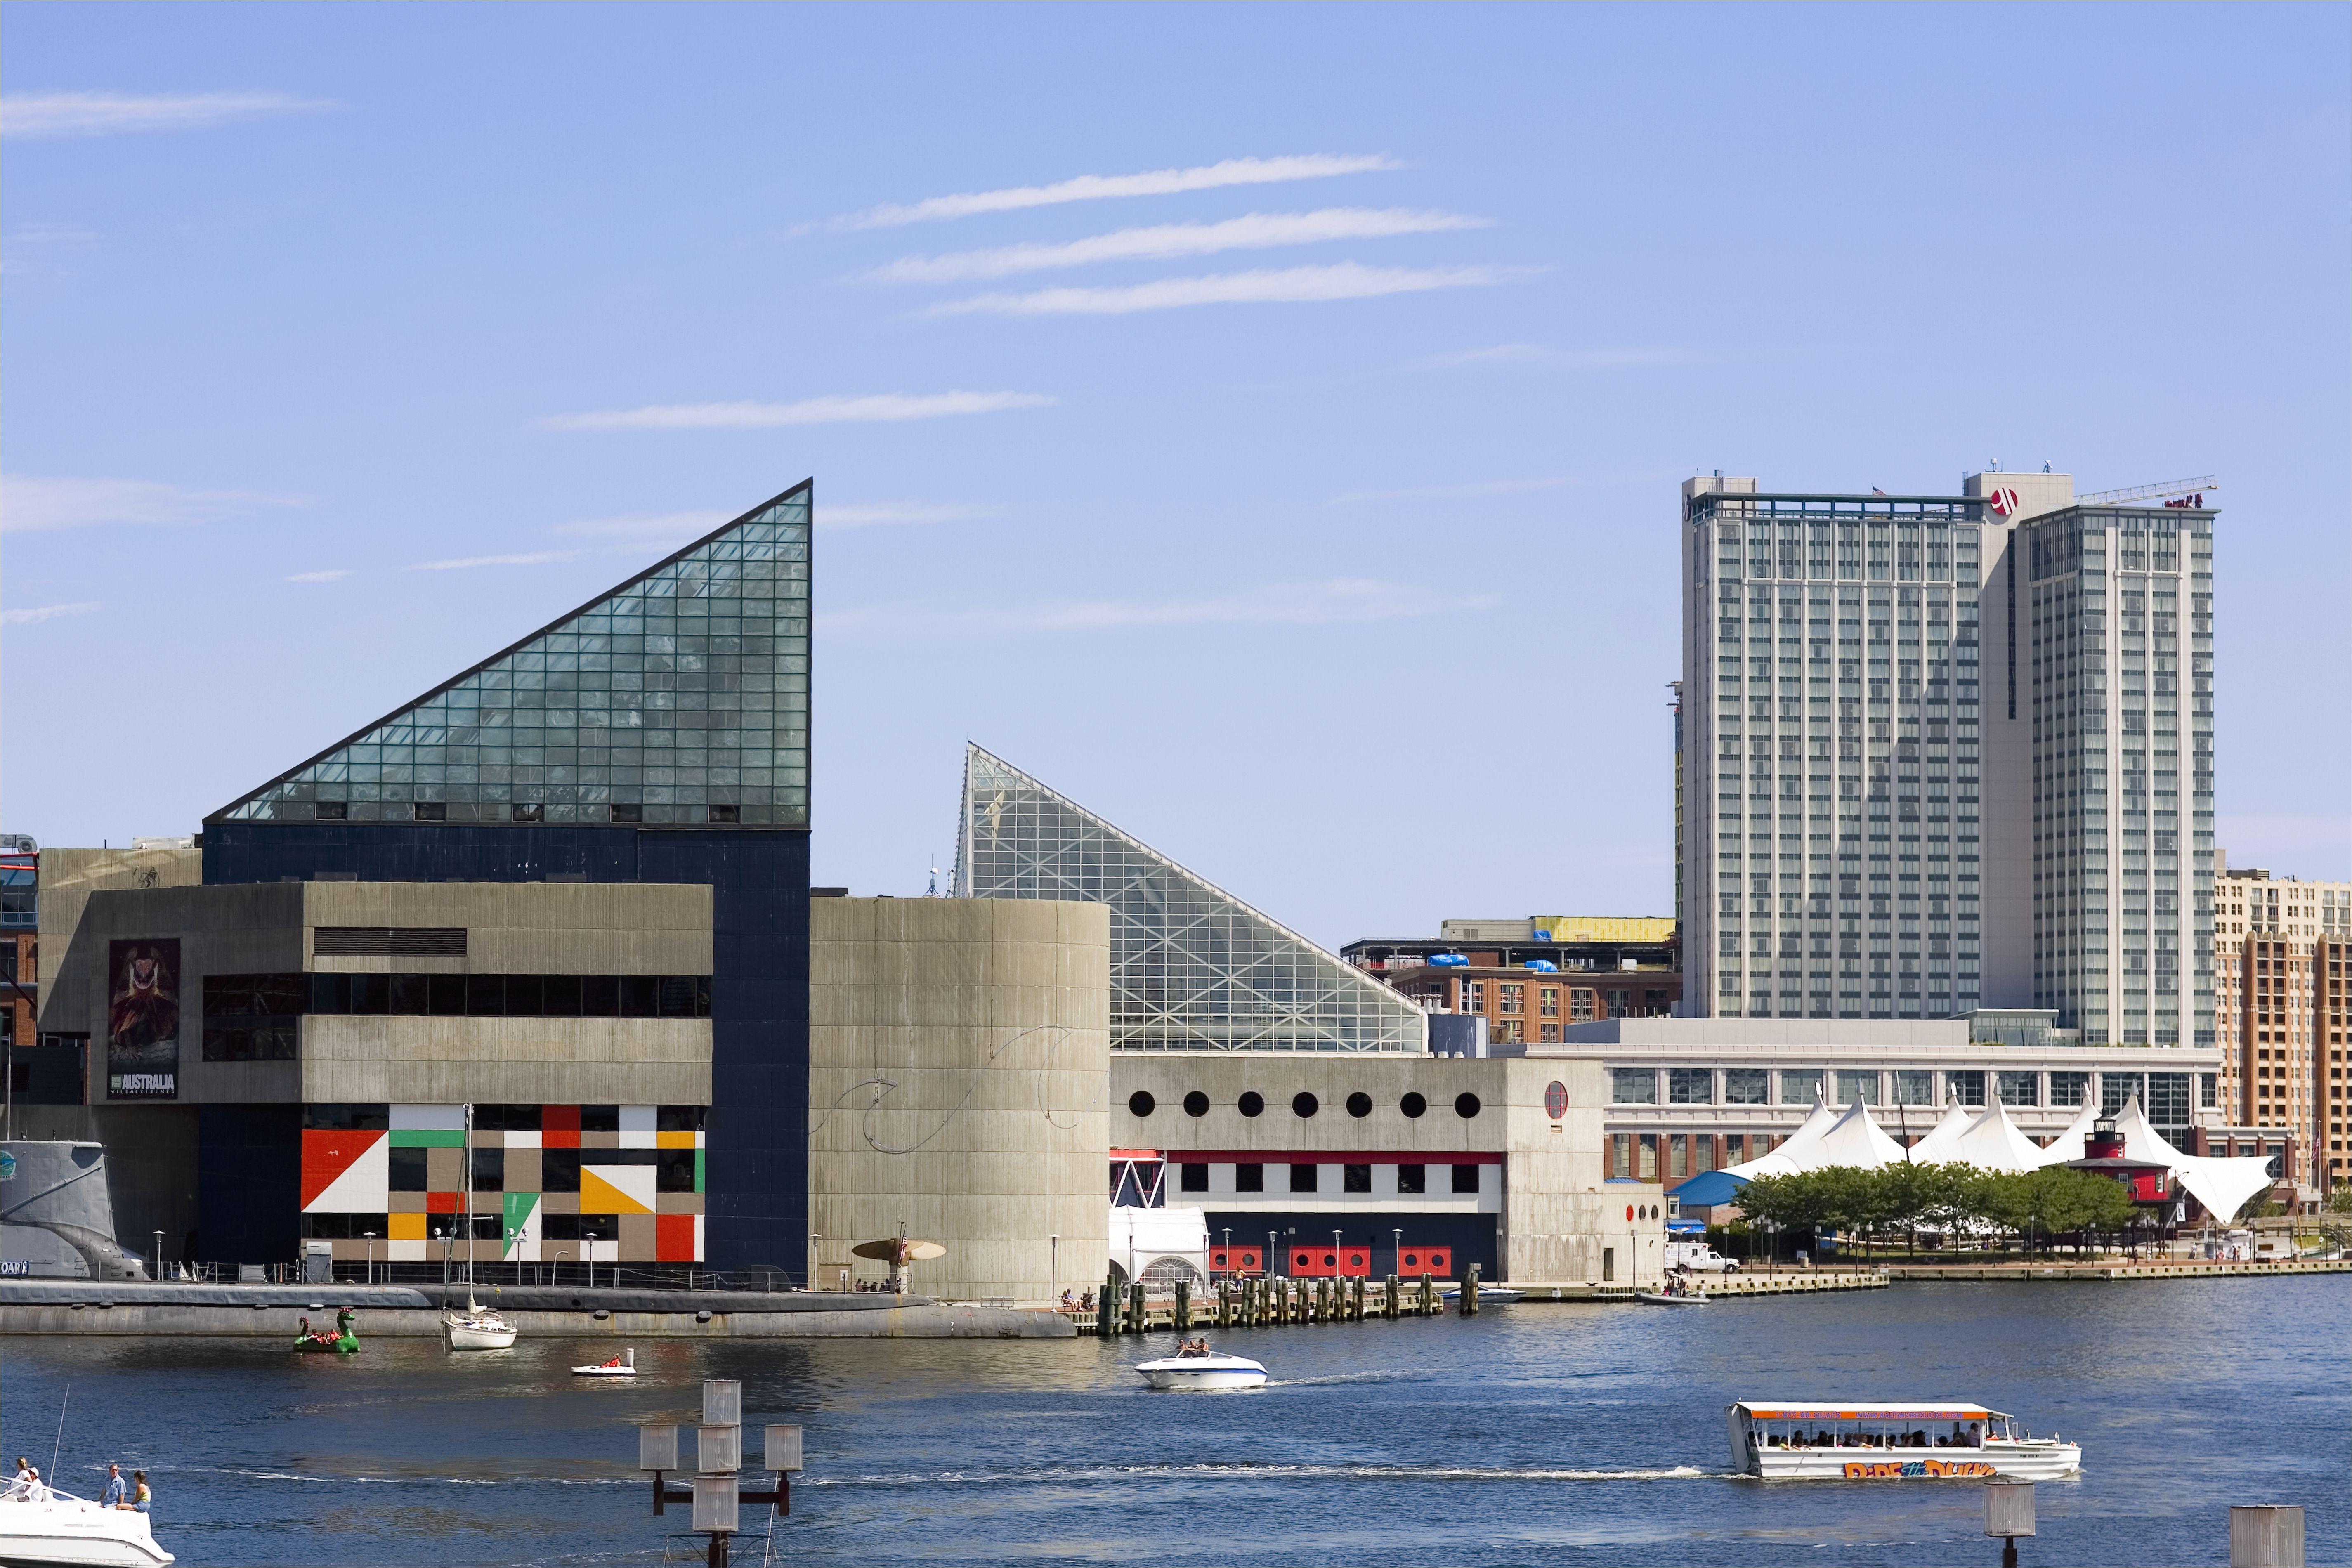 buildingsatthewaterfrontbaltimoremarylandusa 5bd5dd61c9e77c0026a5eeb3 jpg